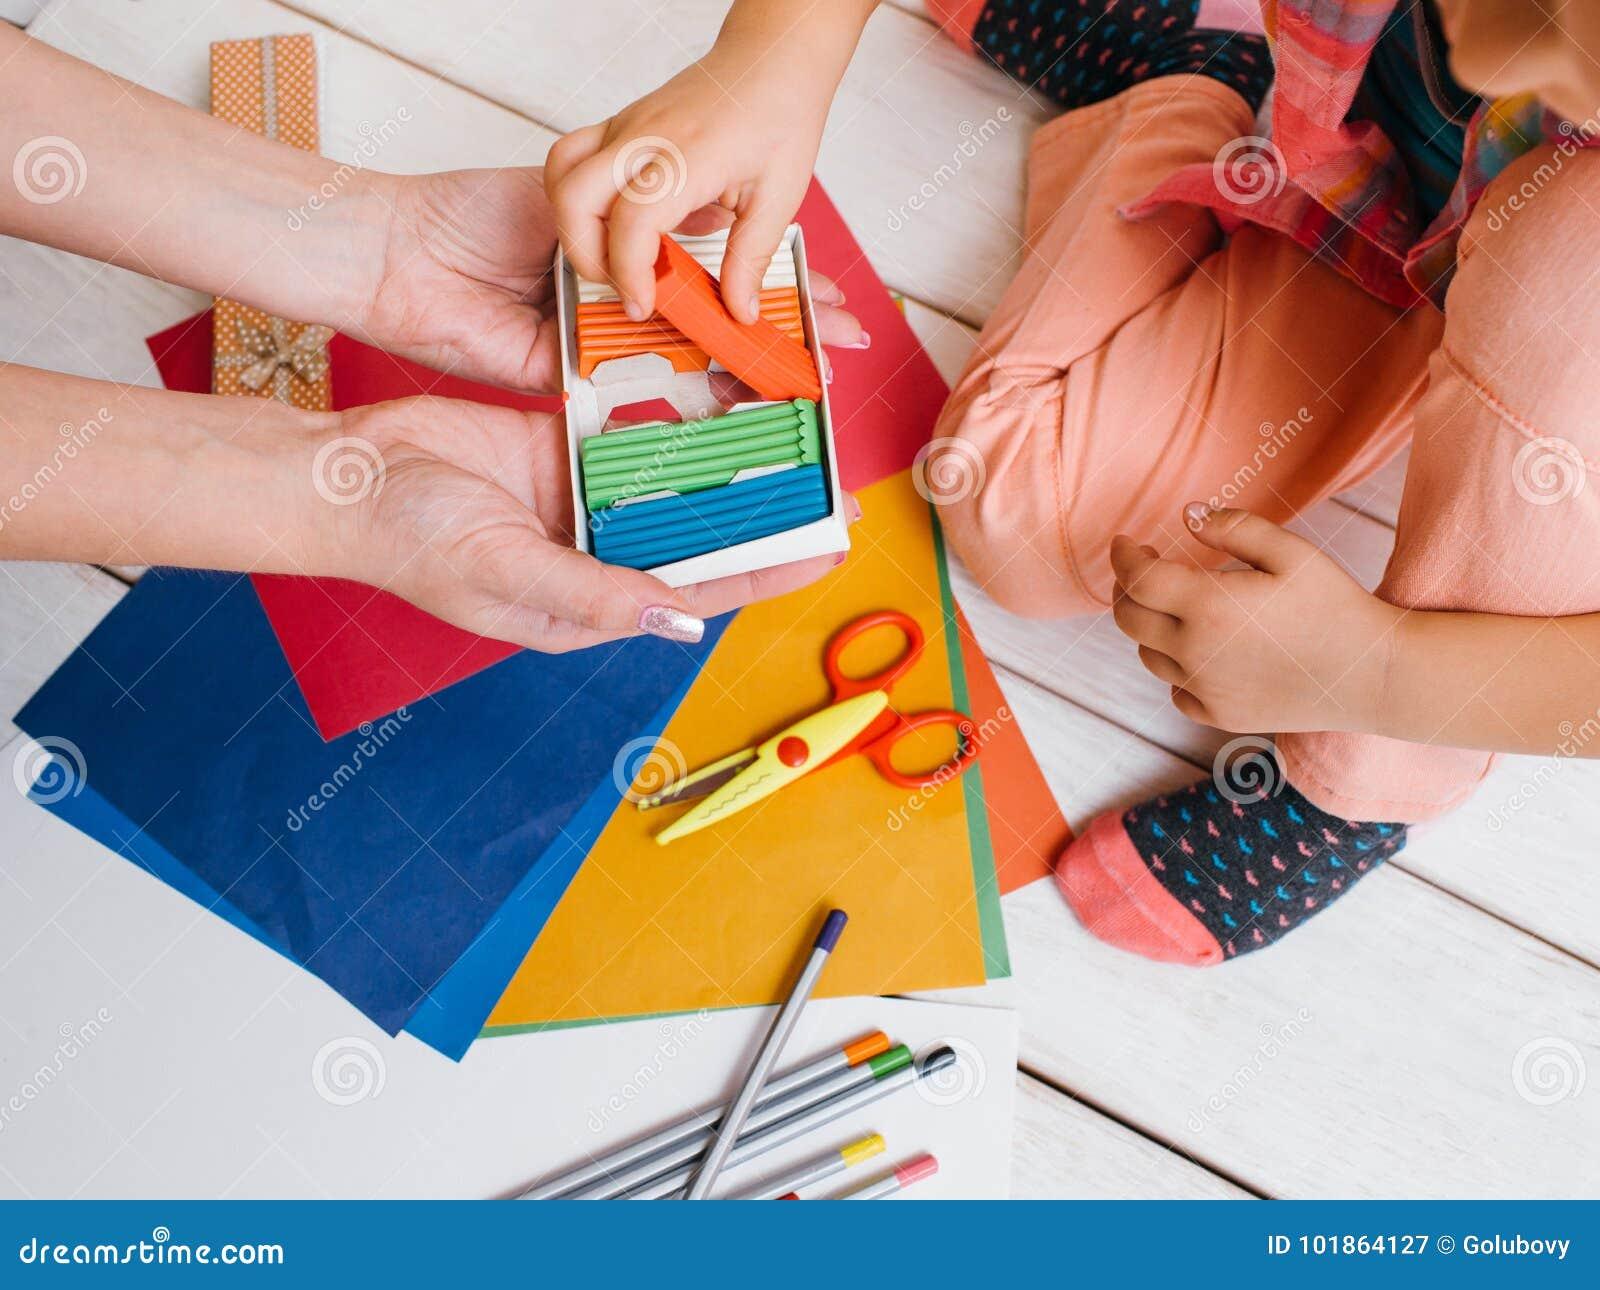 Early child education. Creative art family